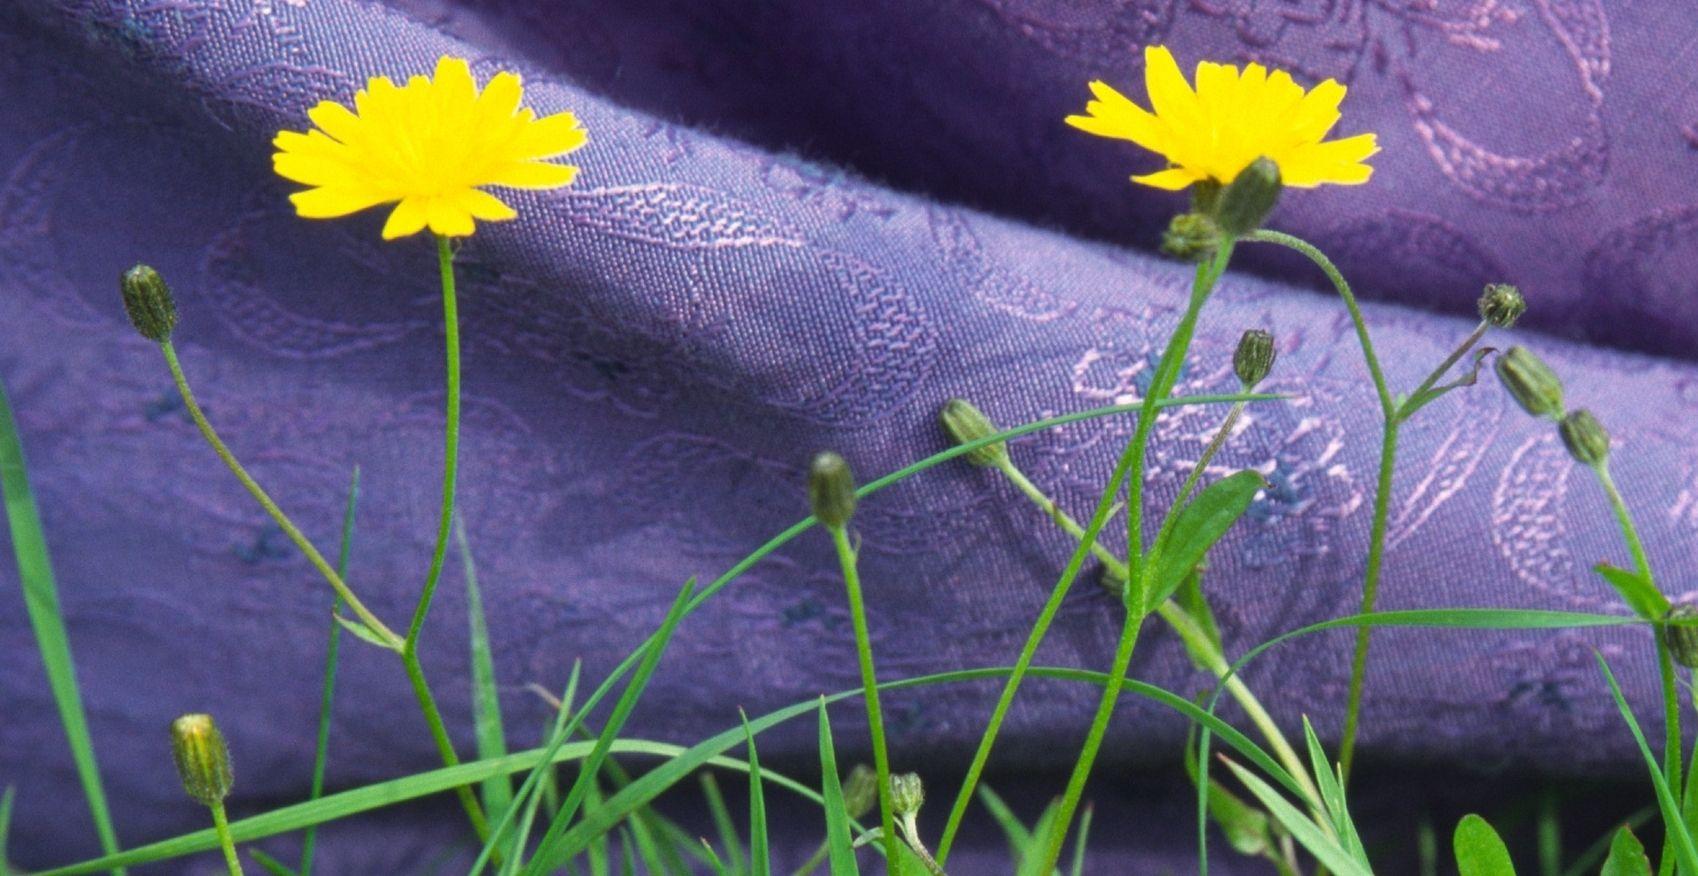 Susan MacWilliam, Garden Series: Dress and Dandelions, 2001/2006, digital print, 16 x 24 inches, ed: 5 + 2AP.